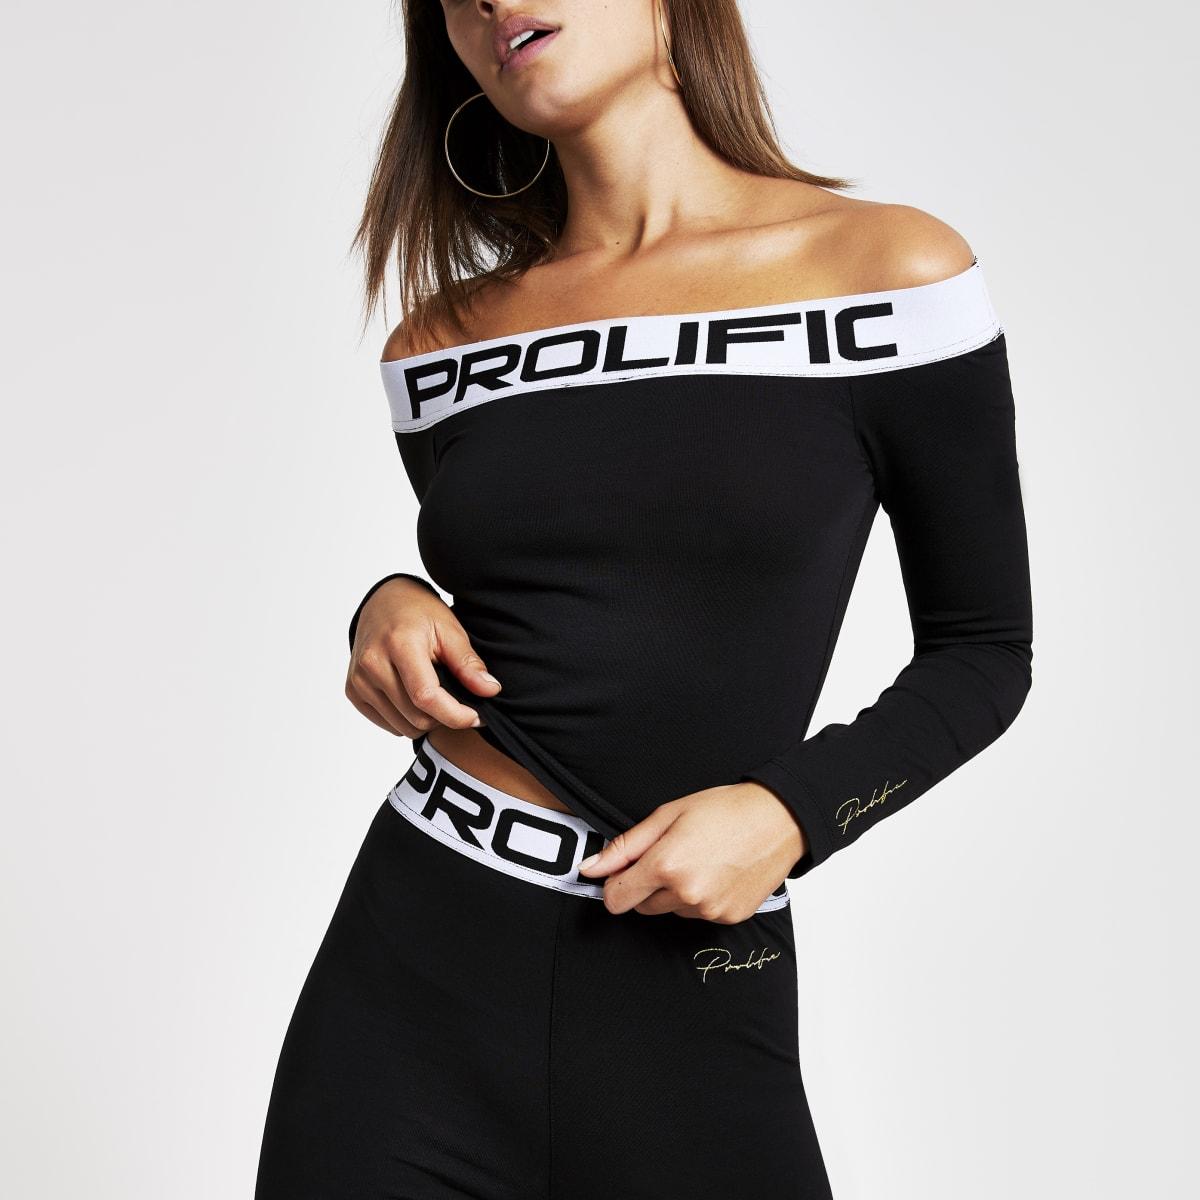 Black 'Prolific' bardot top